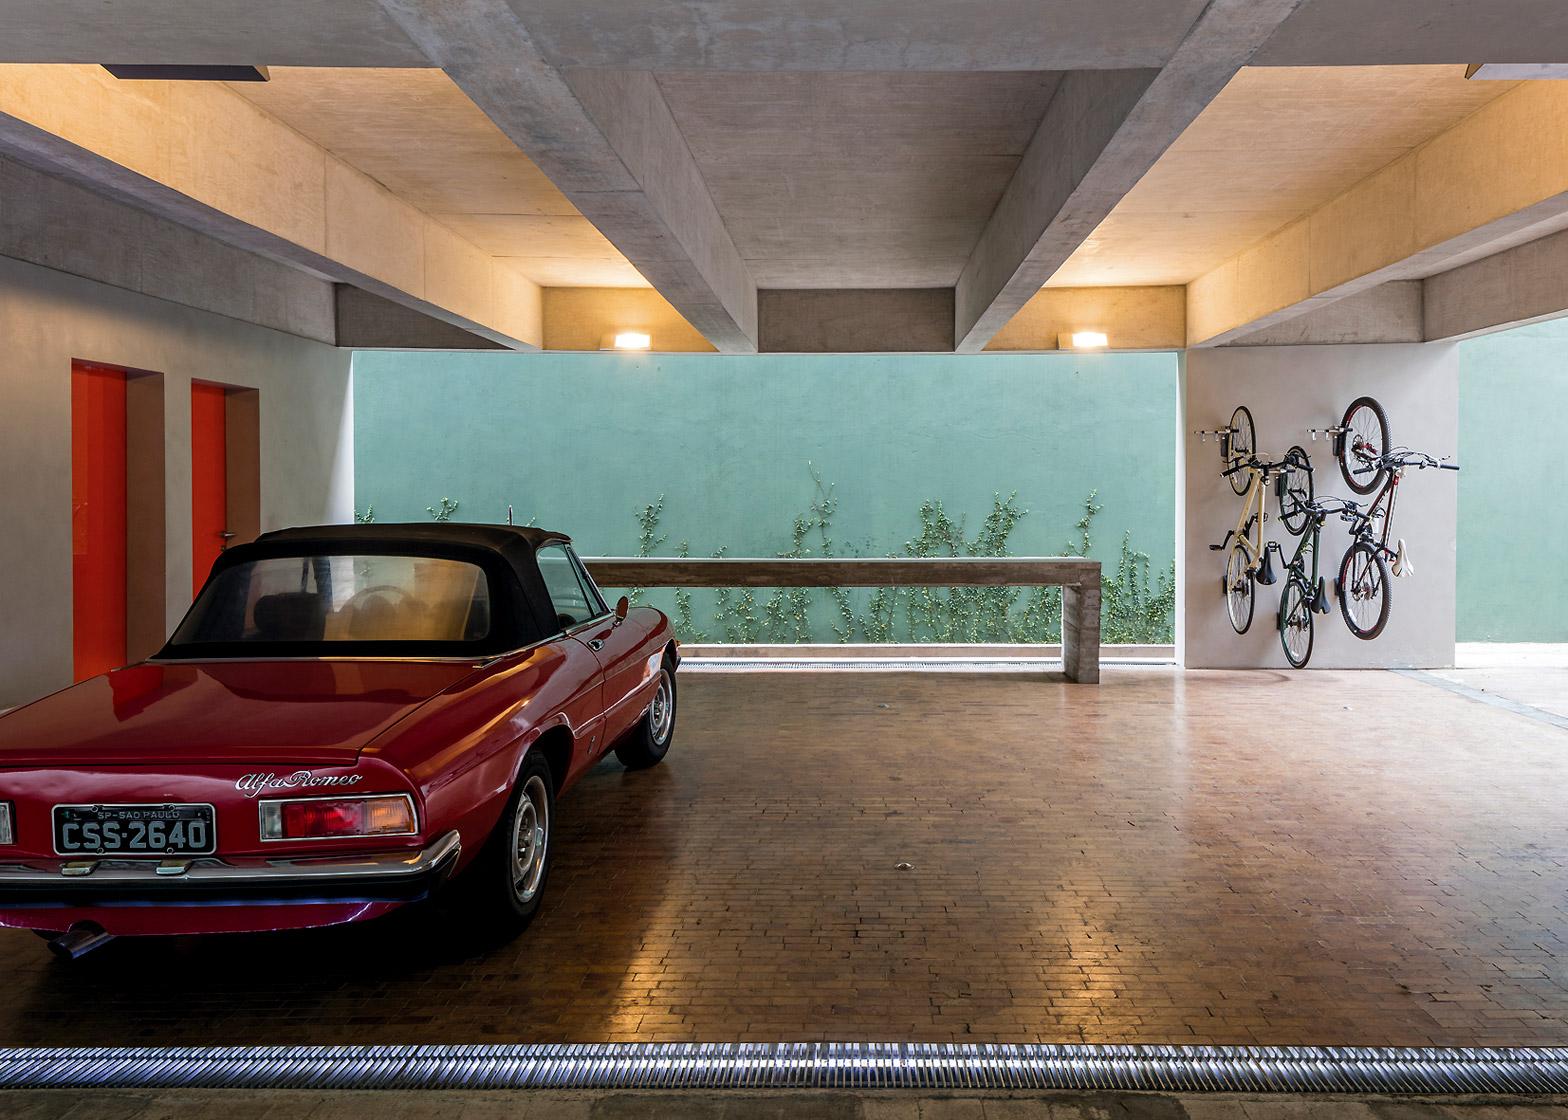 private-house-studio-campanas-sao-paulo-designers-architecture-piassava-palm-fibre-facade-leonardo-finotti-photography_dezeen_1568_10.jpg